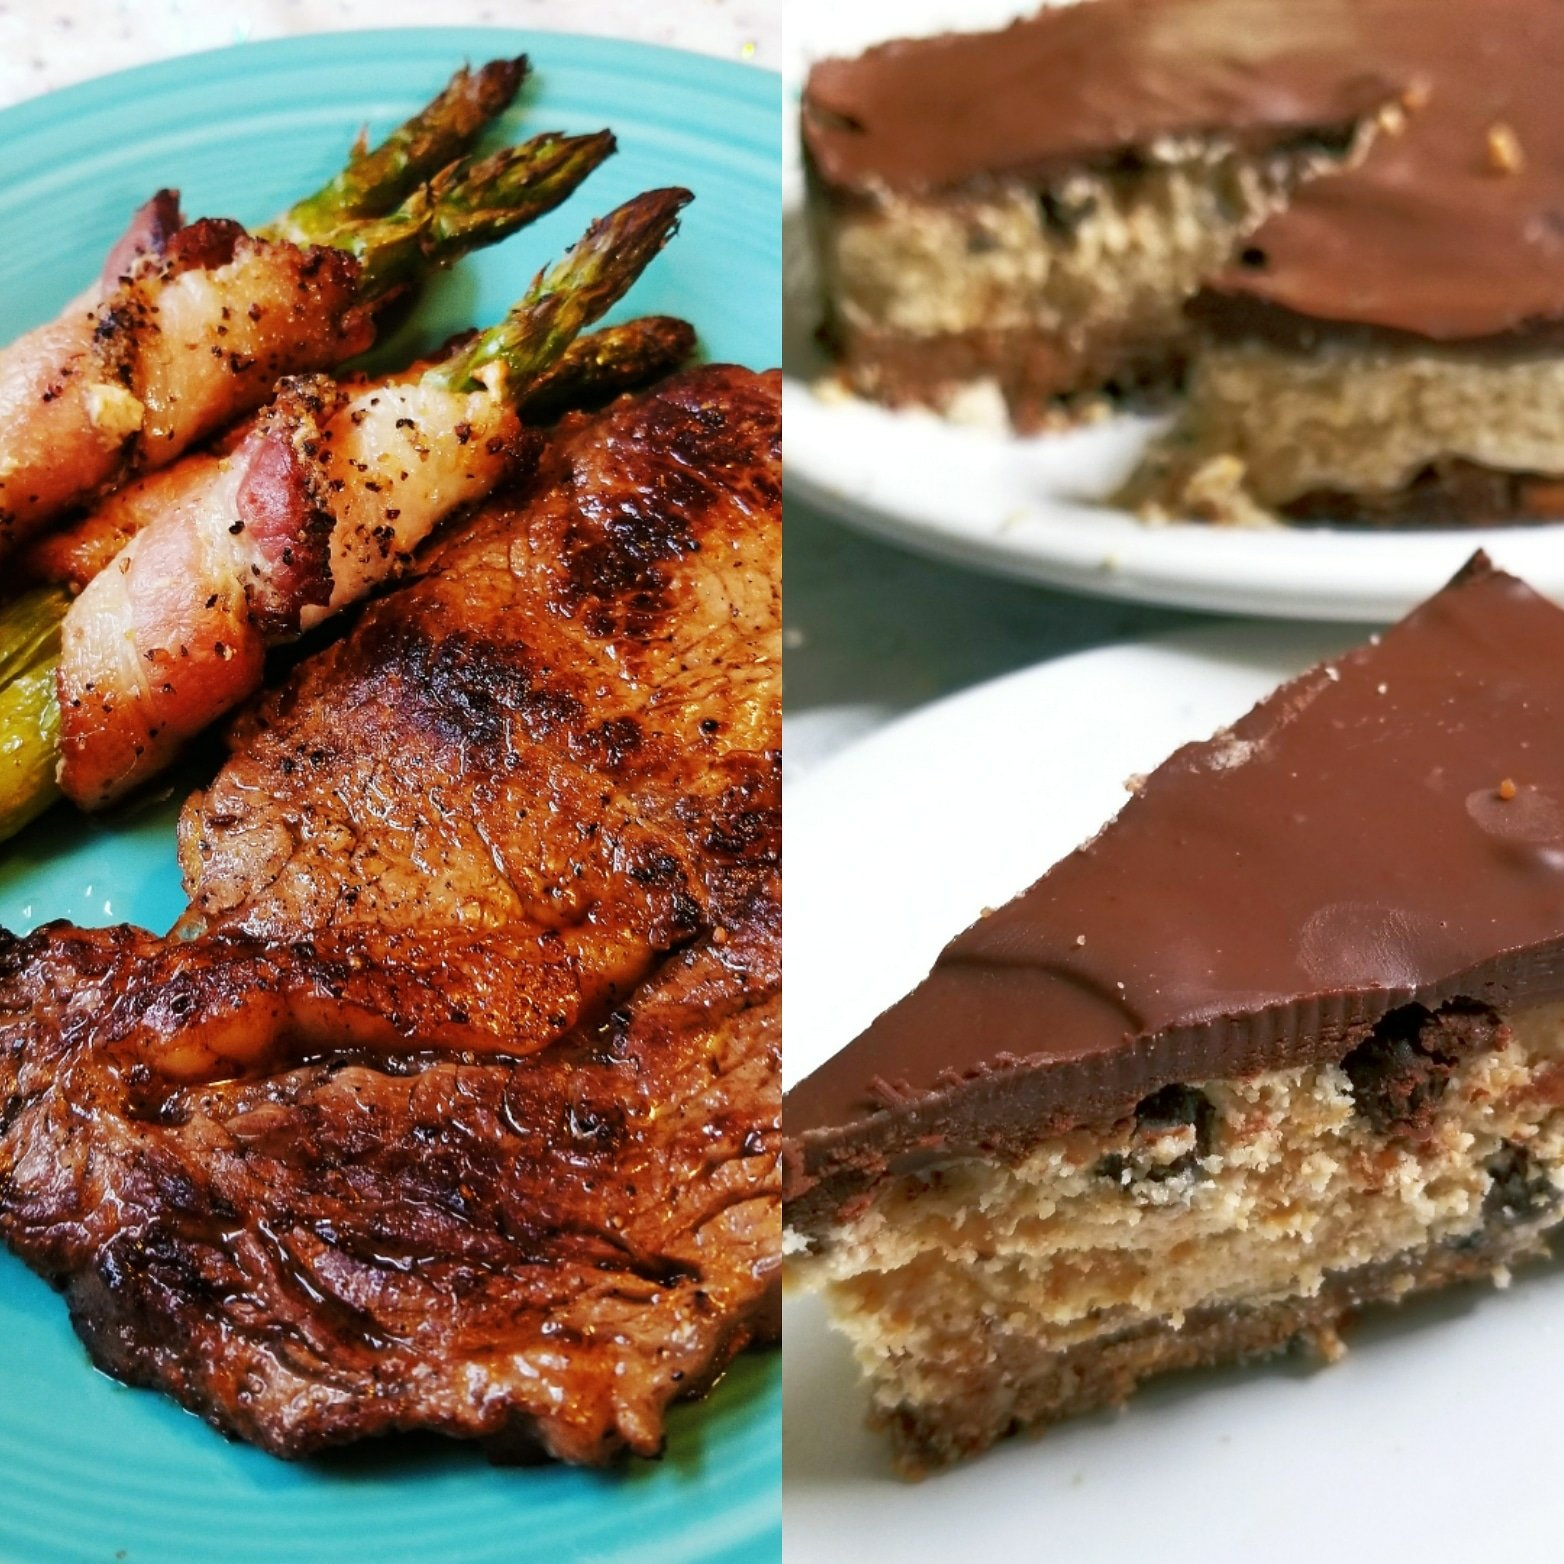 img 20180902 065027 5461989910428 - Paleo & Vegan Cookie Dough Cheesecake and Sesame Ginger Ribeye Steaks (Gluten-Free) Saturday Cooking Adventures